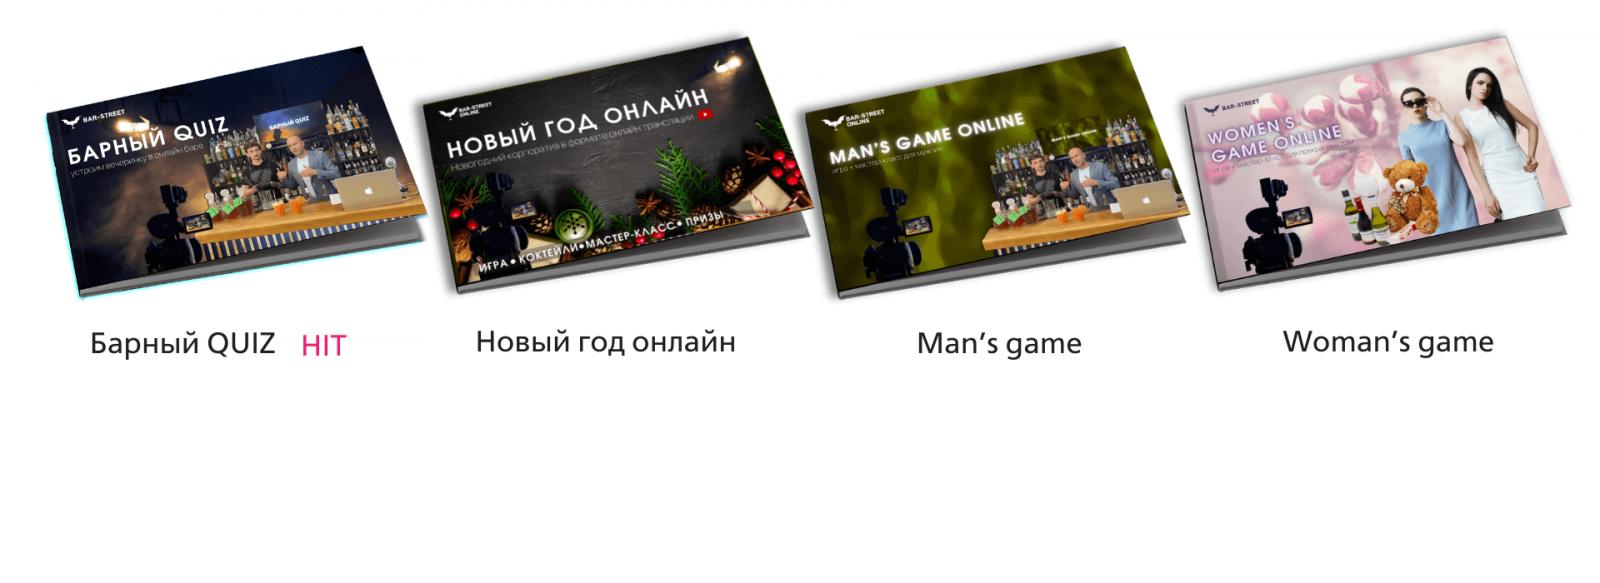 Сценарии игр в онлайн баре